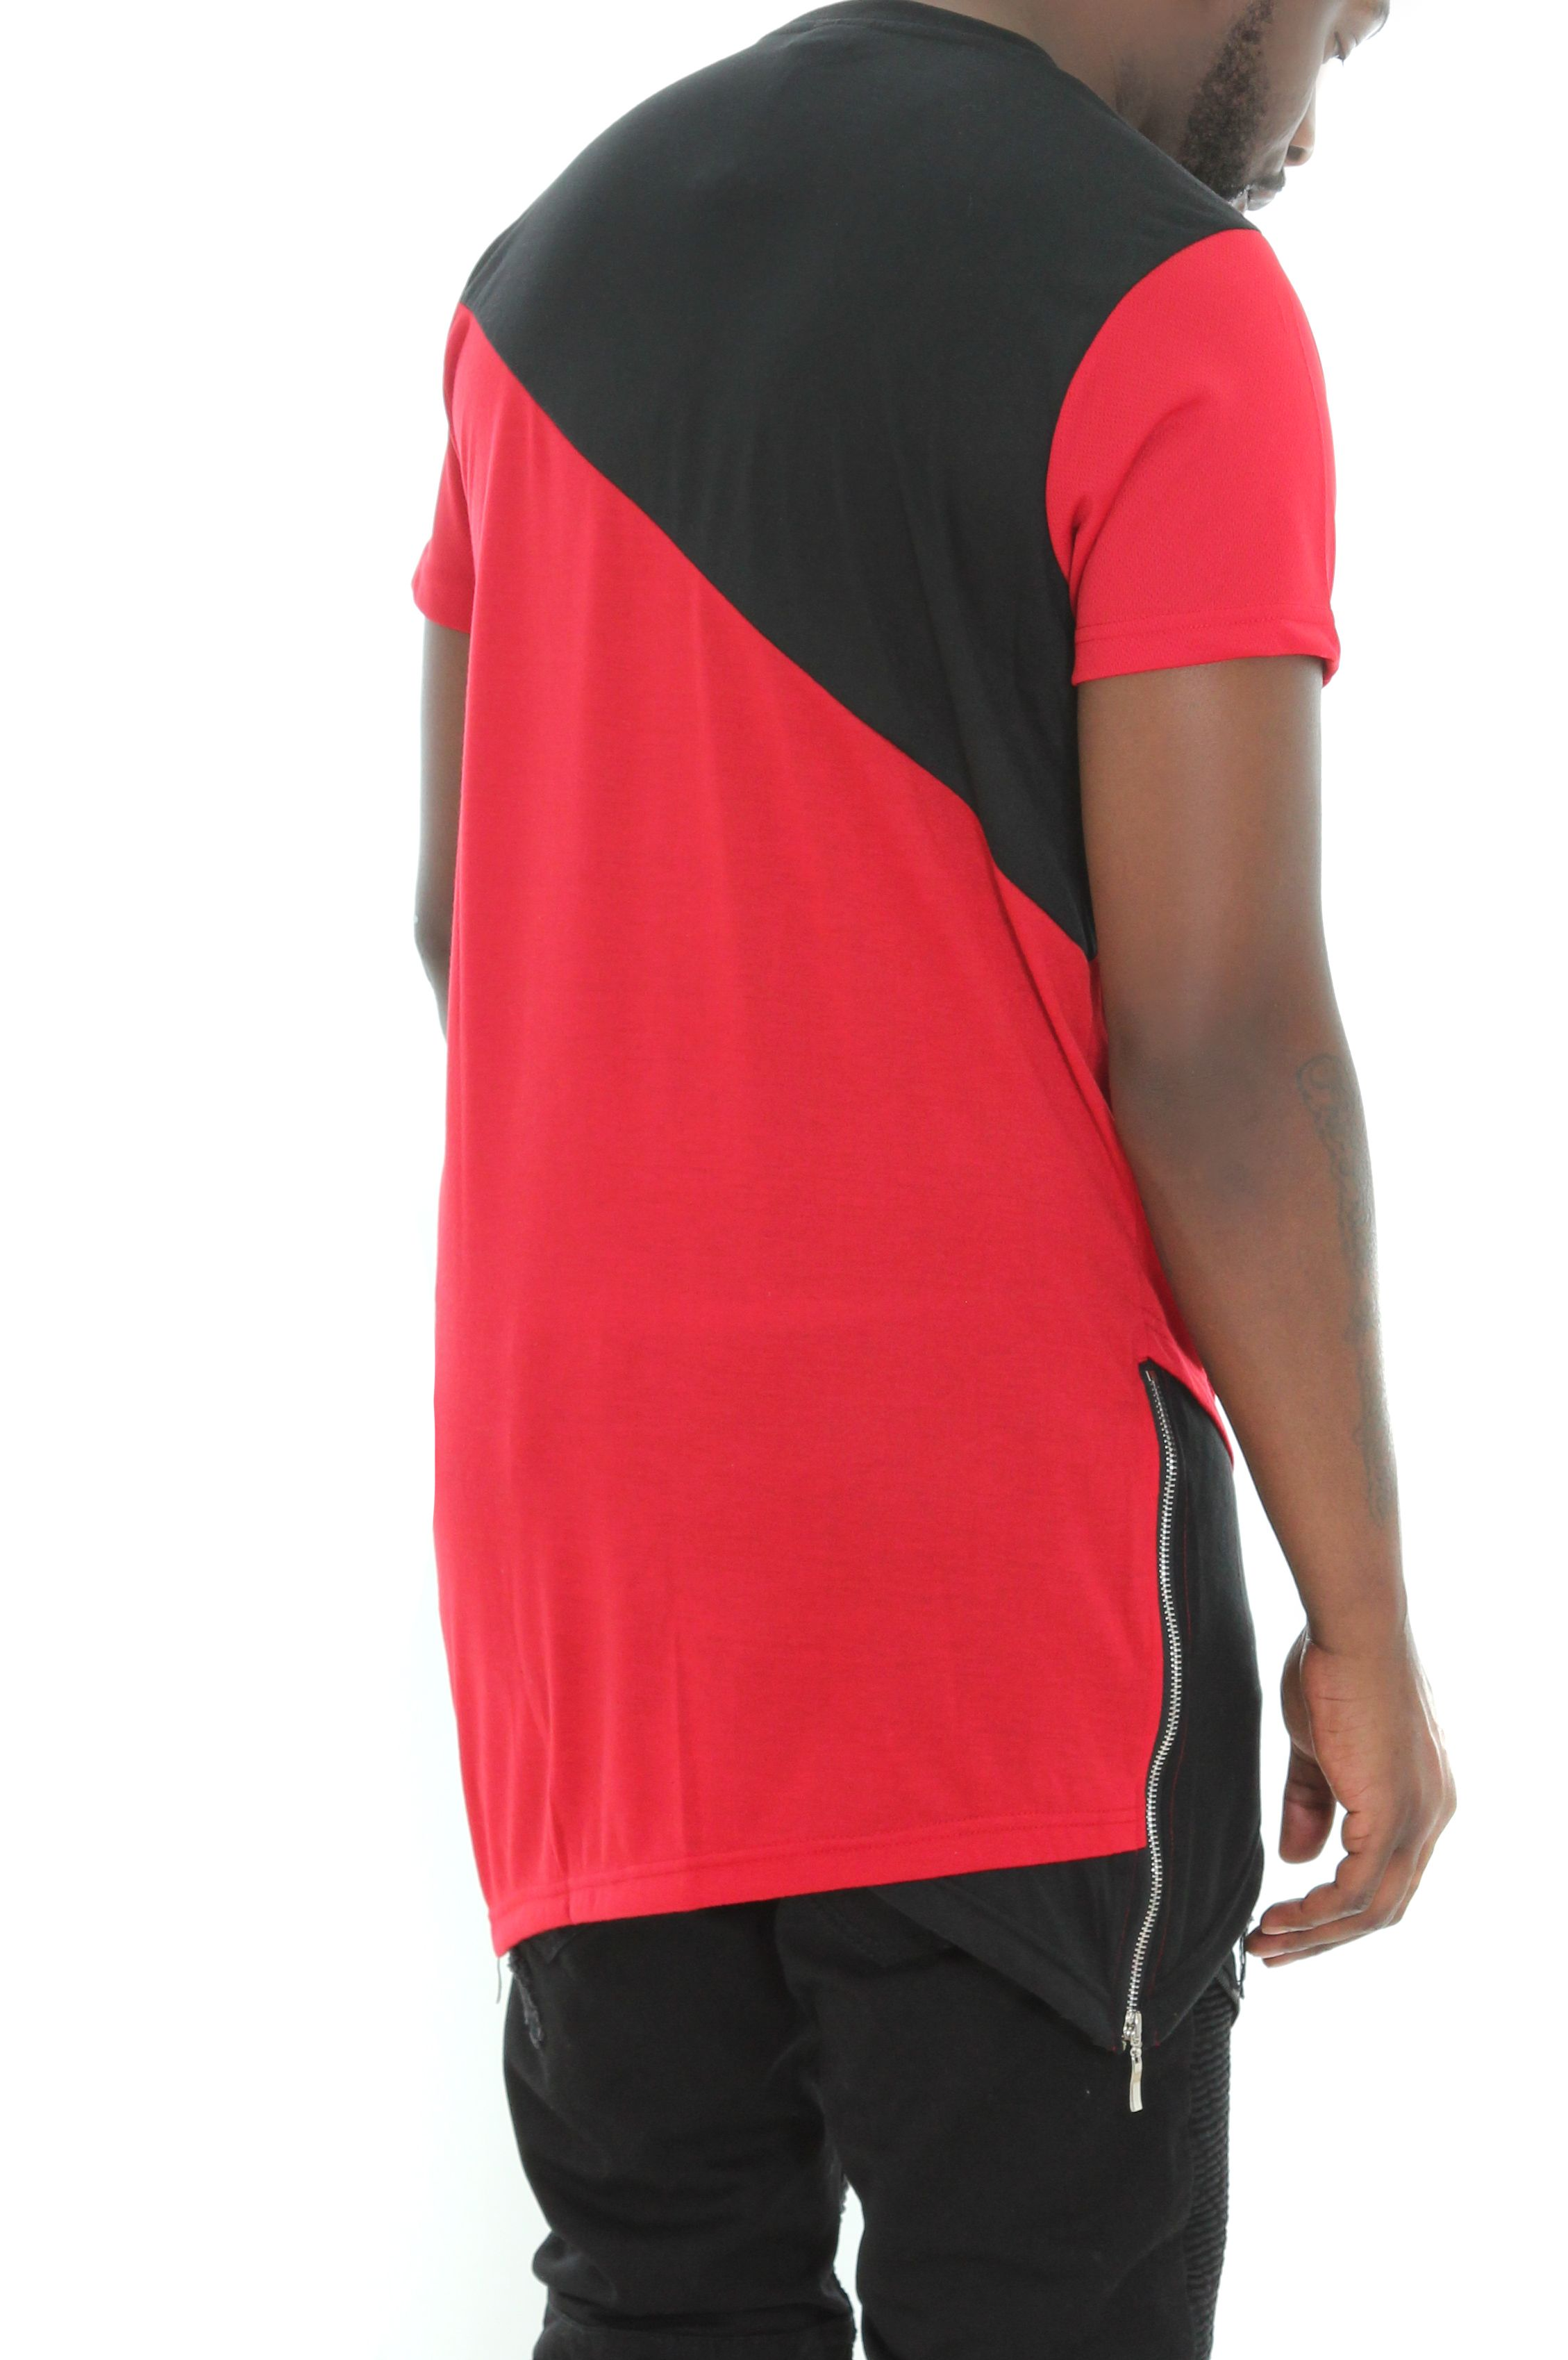 Imperious-Men-039-s-Colorblock-Asymmetric-Hem-Side-Zipper-Longline-T-Shirt thumbnail 10